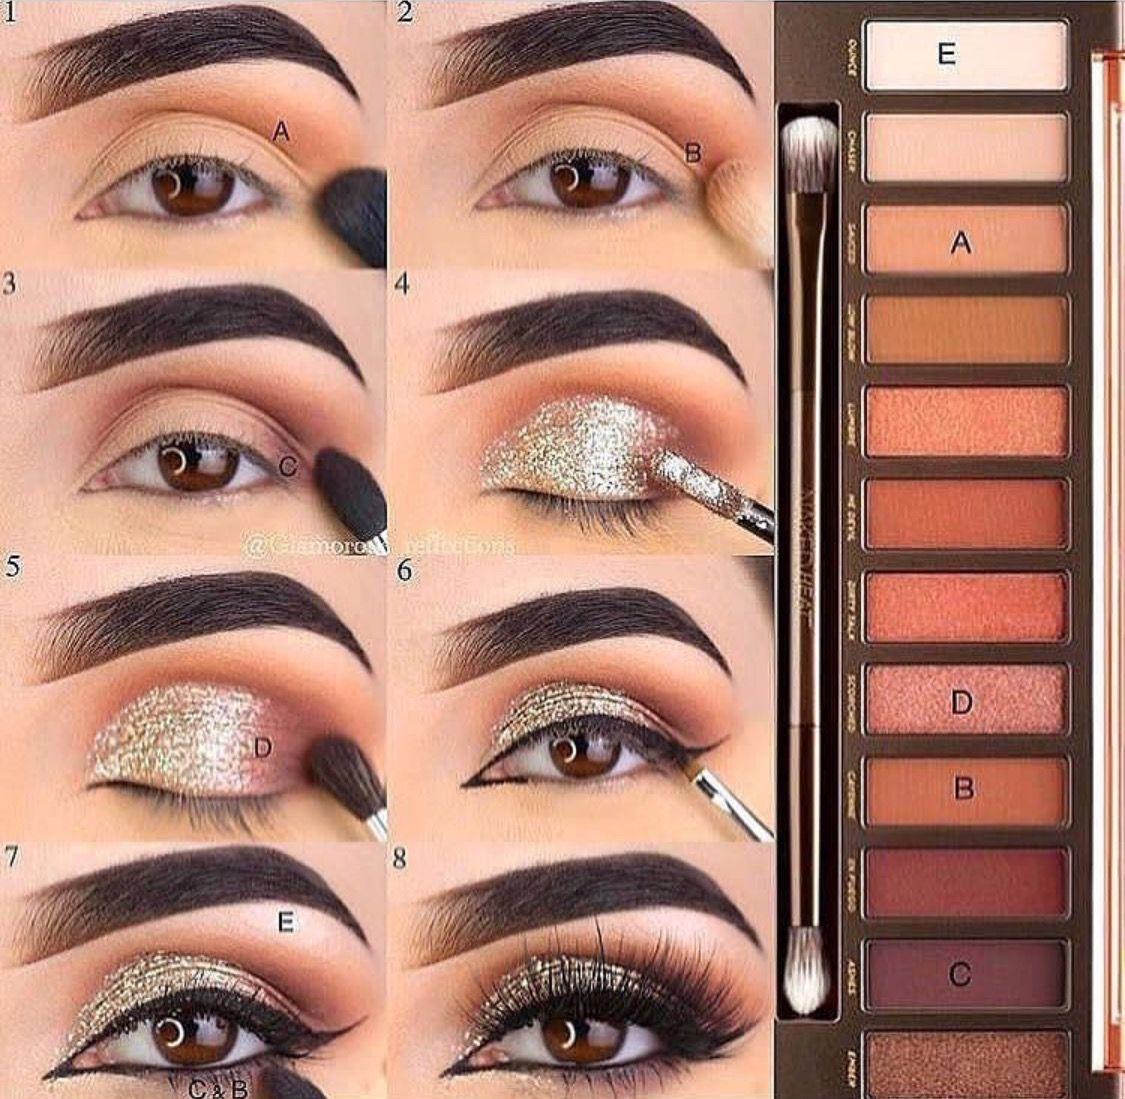 46+ super ideas for eye shadow makeup urban decay #makeup